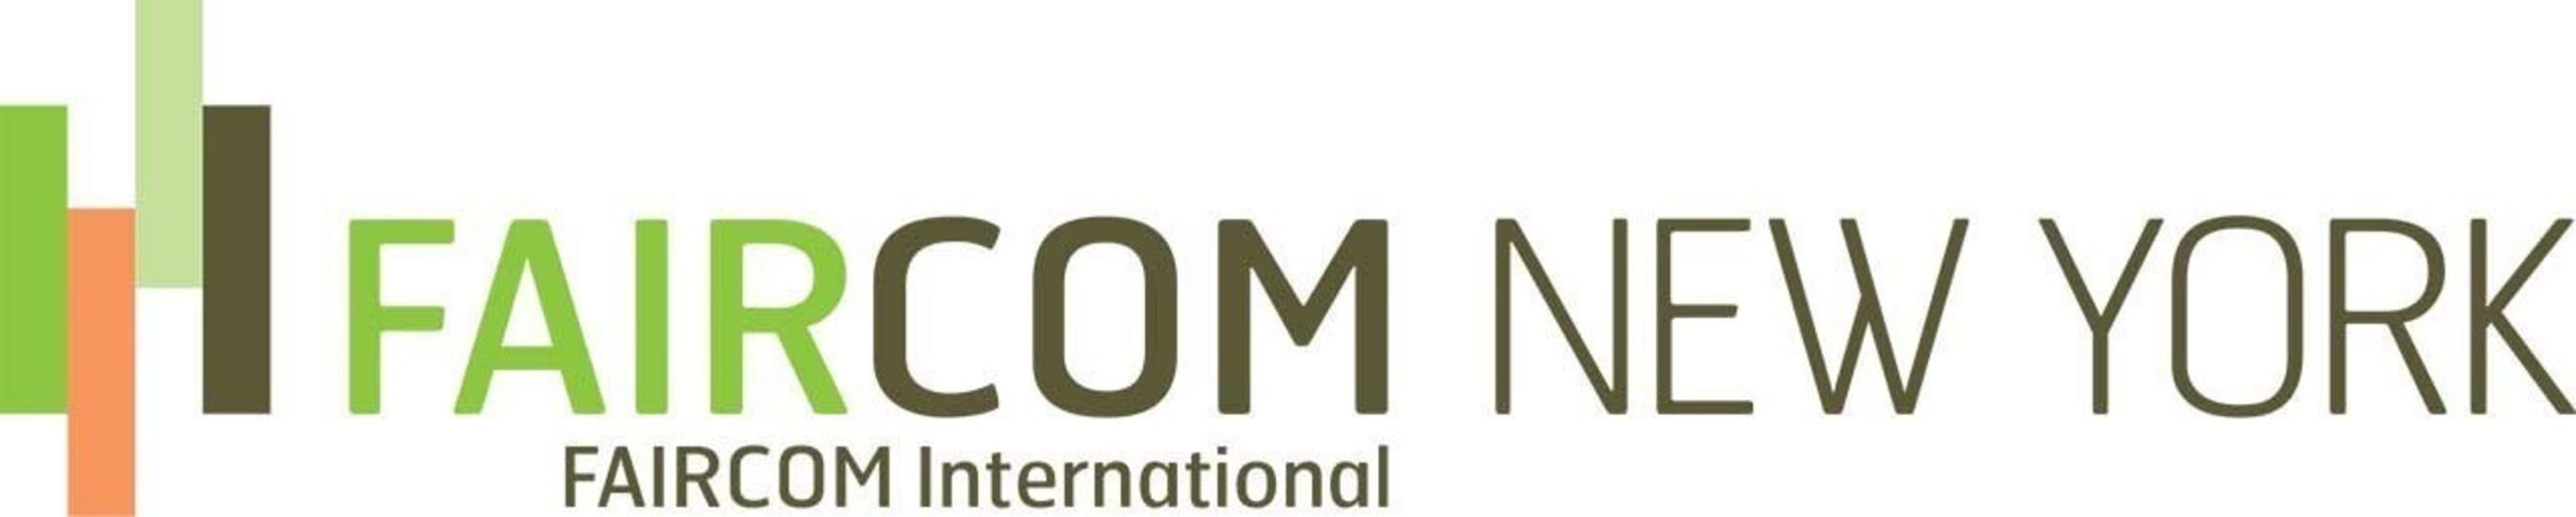 Faircom New York Honored at 2015 Business Awards